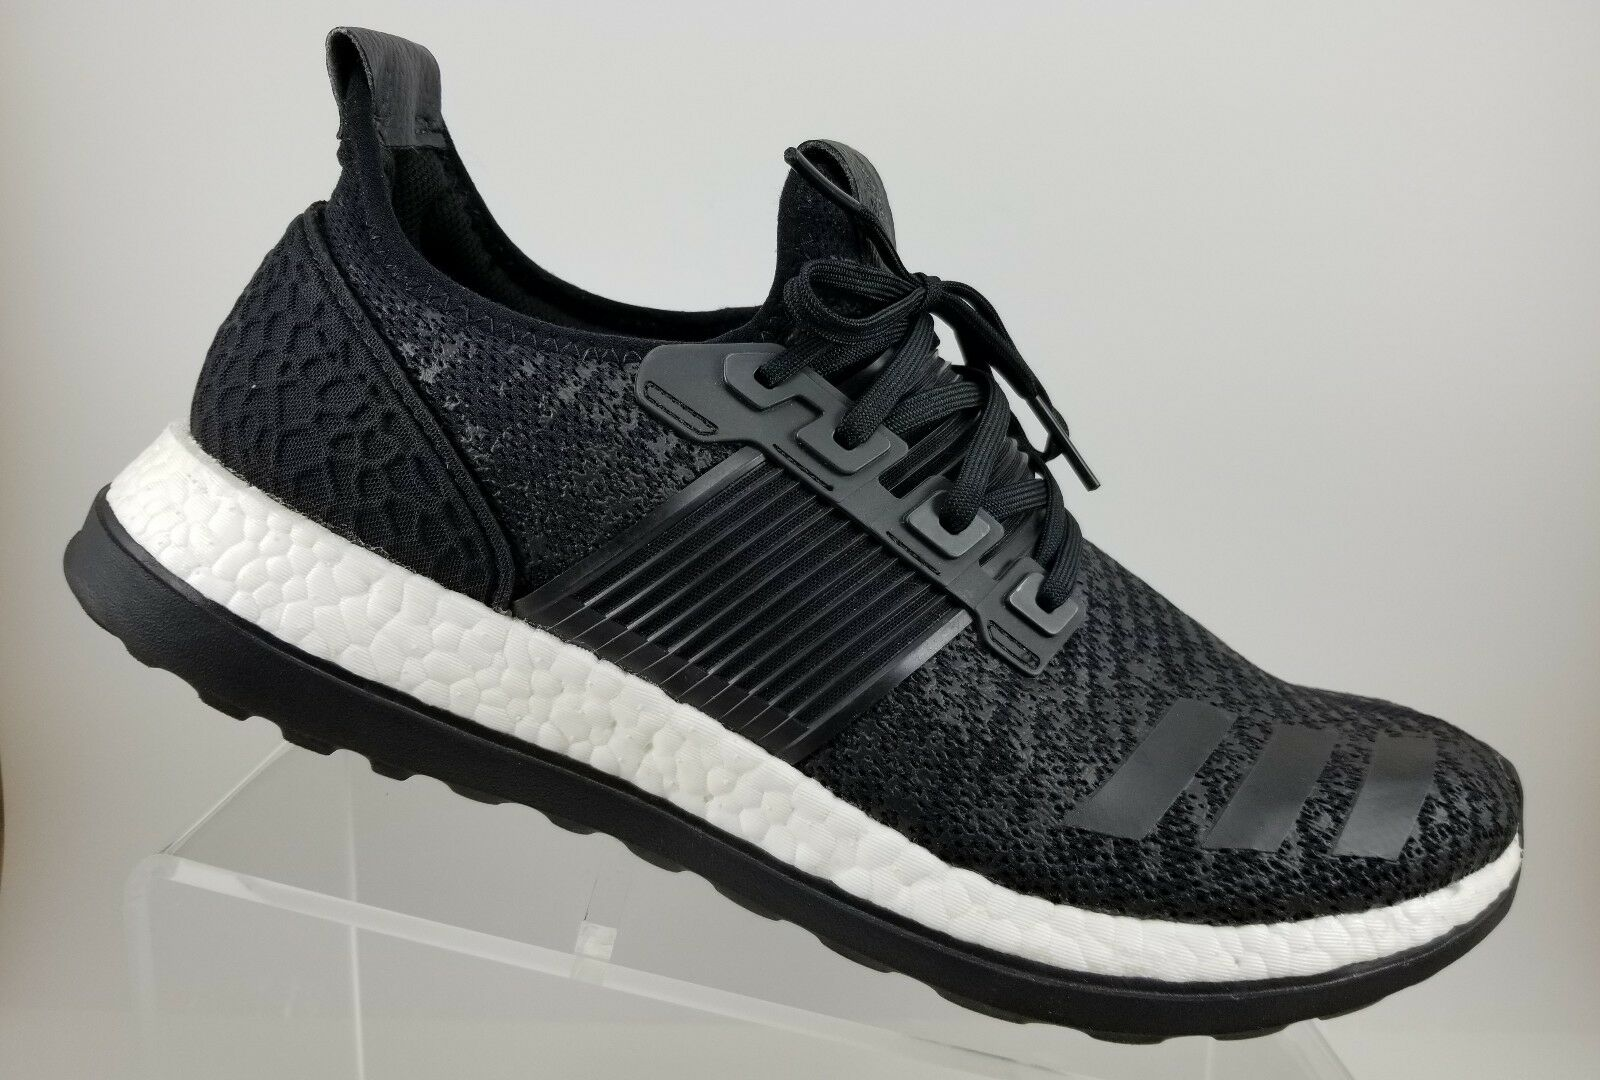 super popular 2a4bf d33f8 Adidas Adidas Adidas PureBoost Black White Athletic Running Walking shoes  Mens 12M BA8613 256cc8